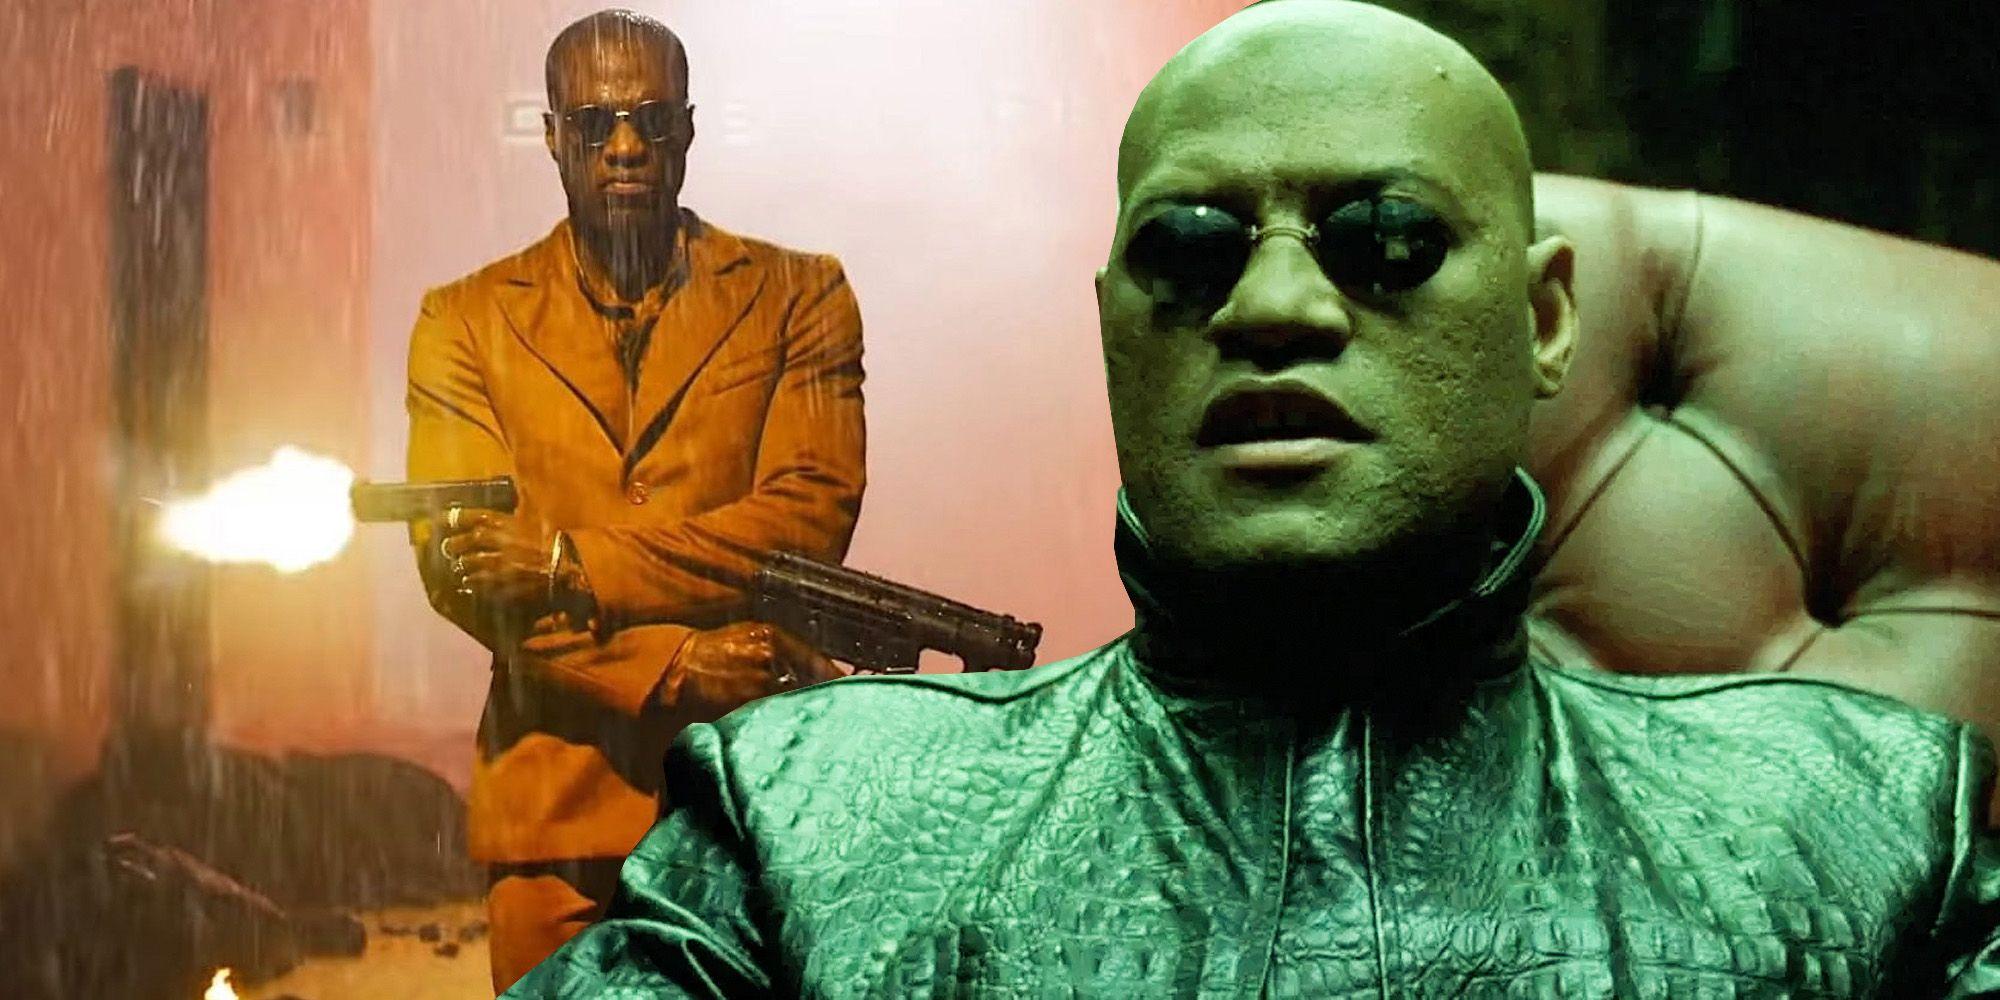 Young Morpheus Confirmed In The Matrix Resurrections